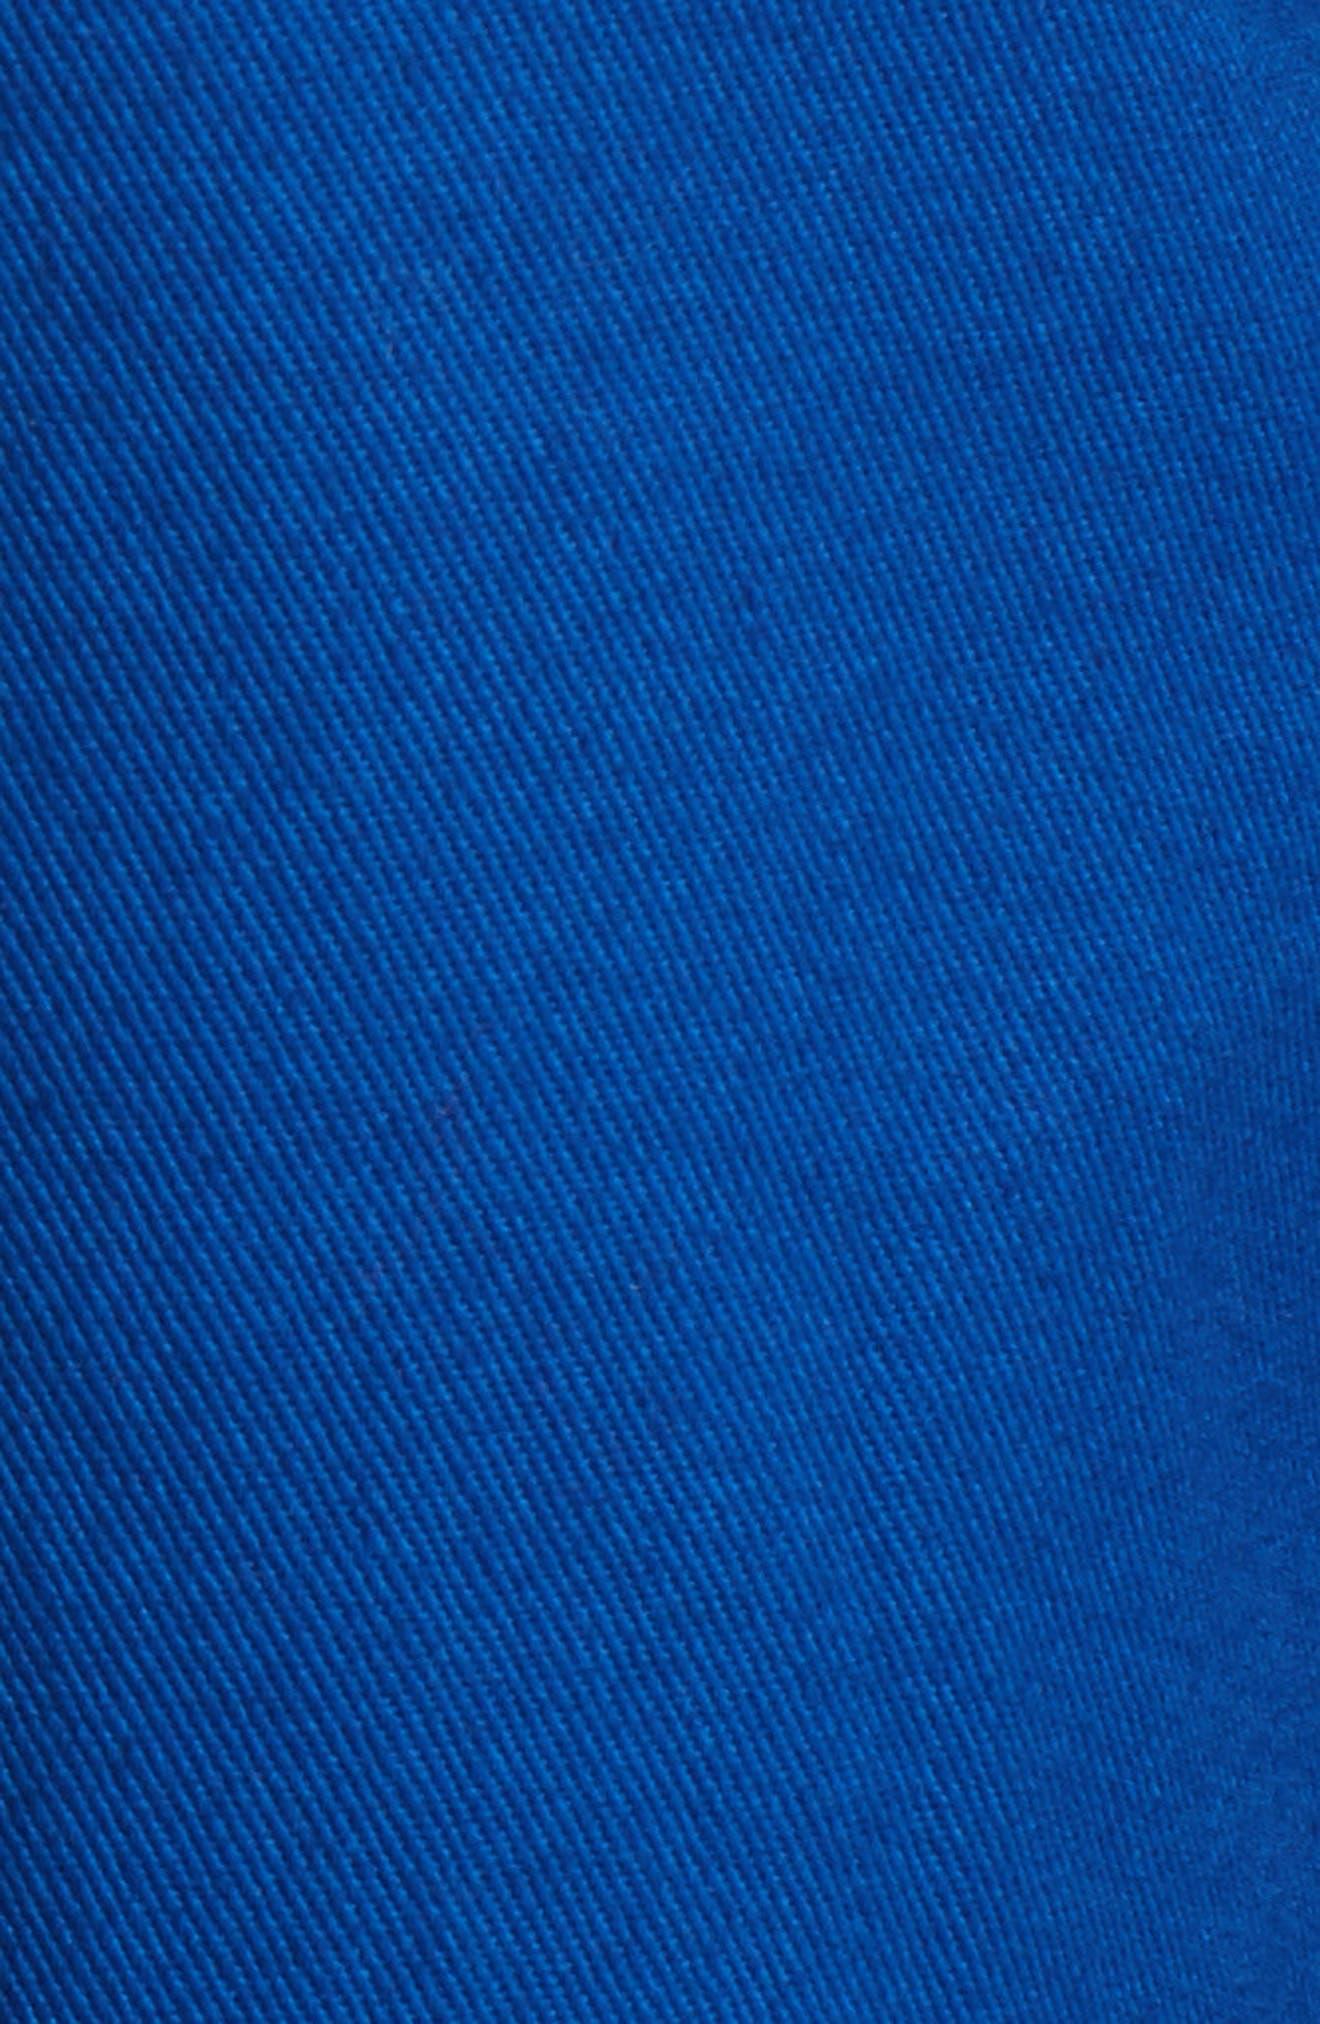 Patch Varsity Jacket,                             Alternate thumbnail 6, color,                             Railroad Blue